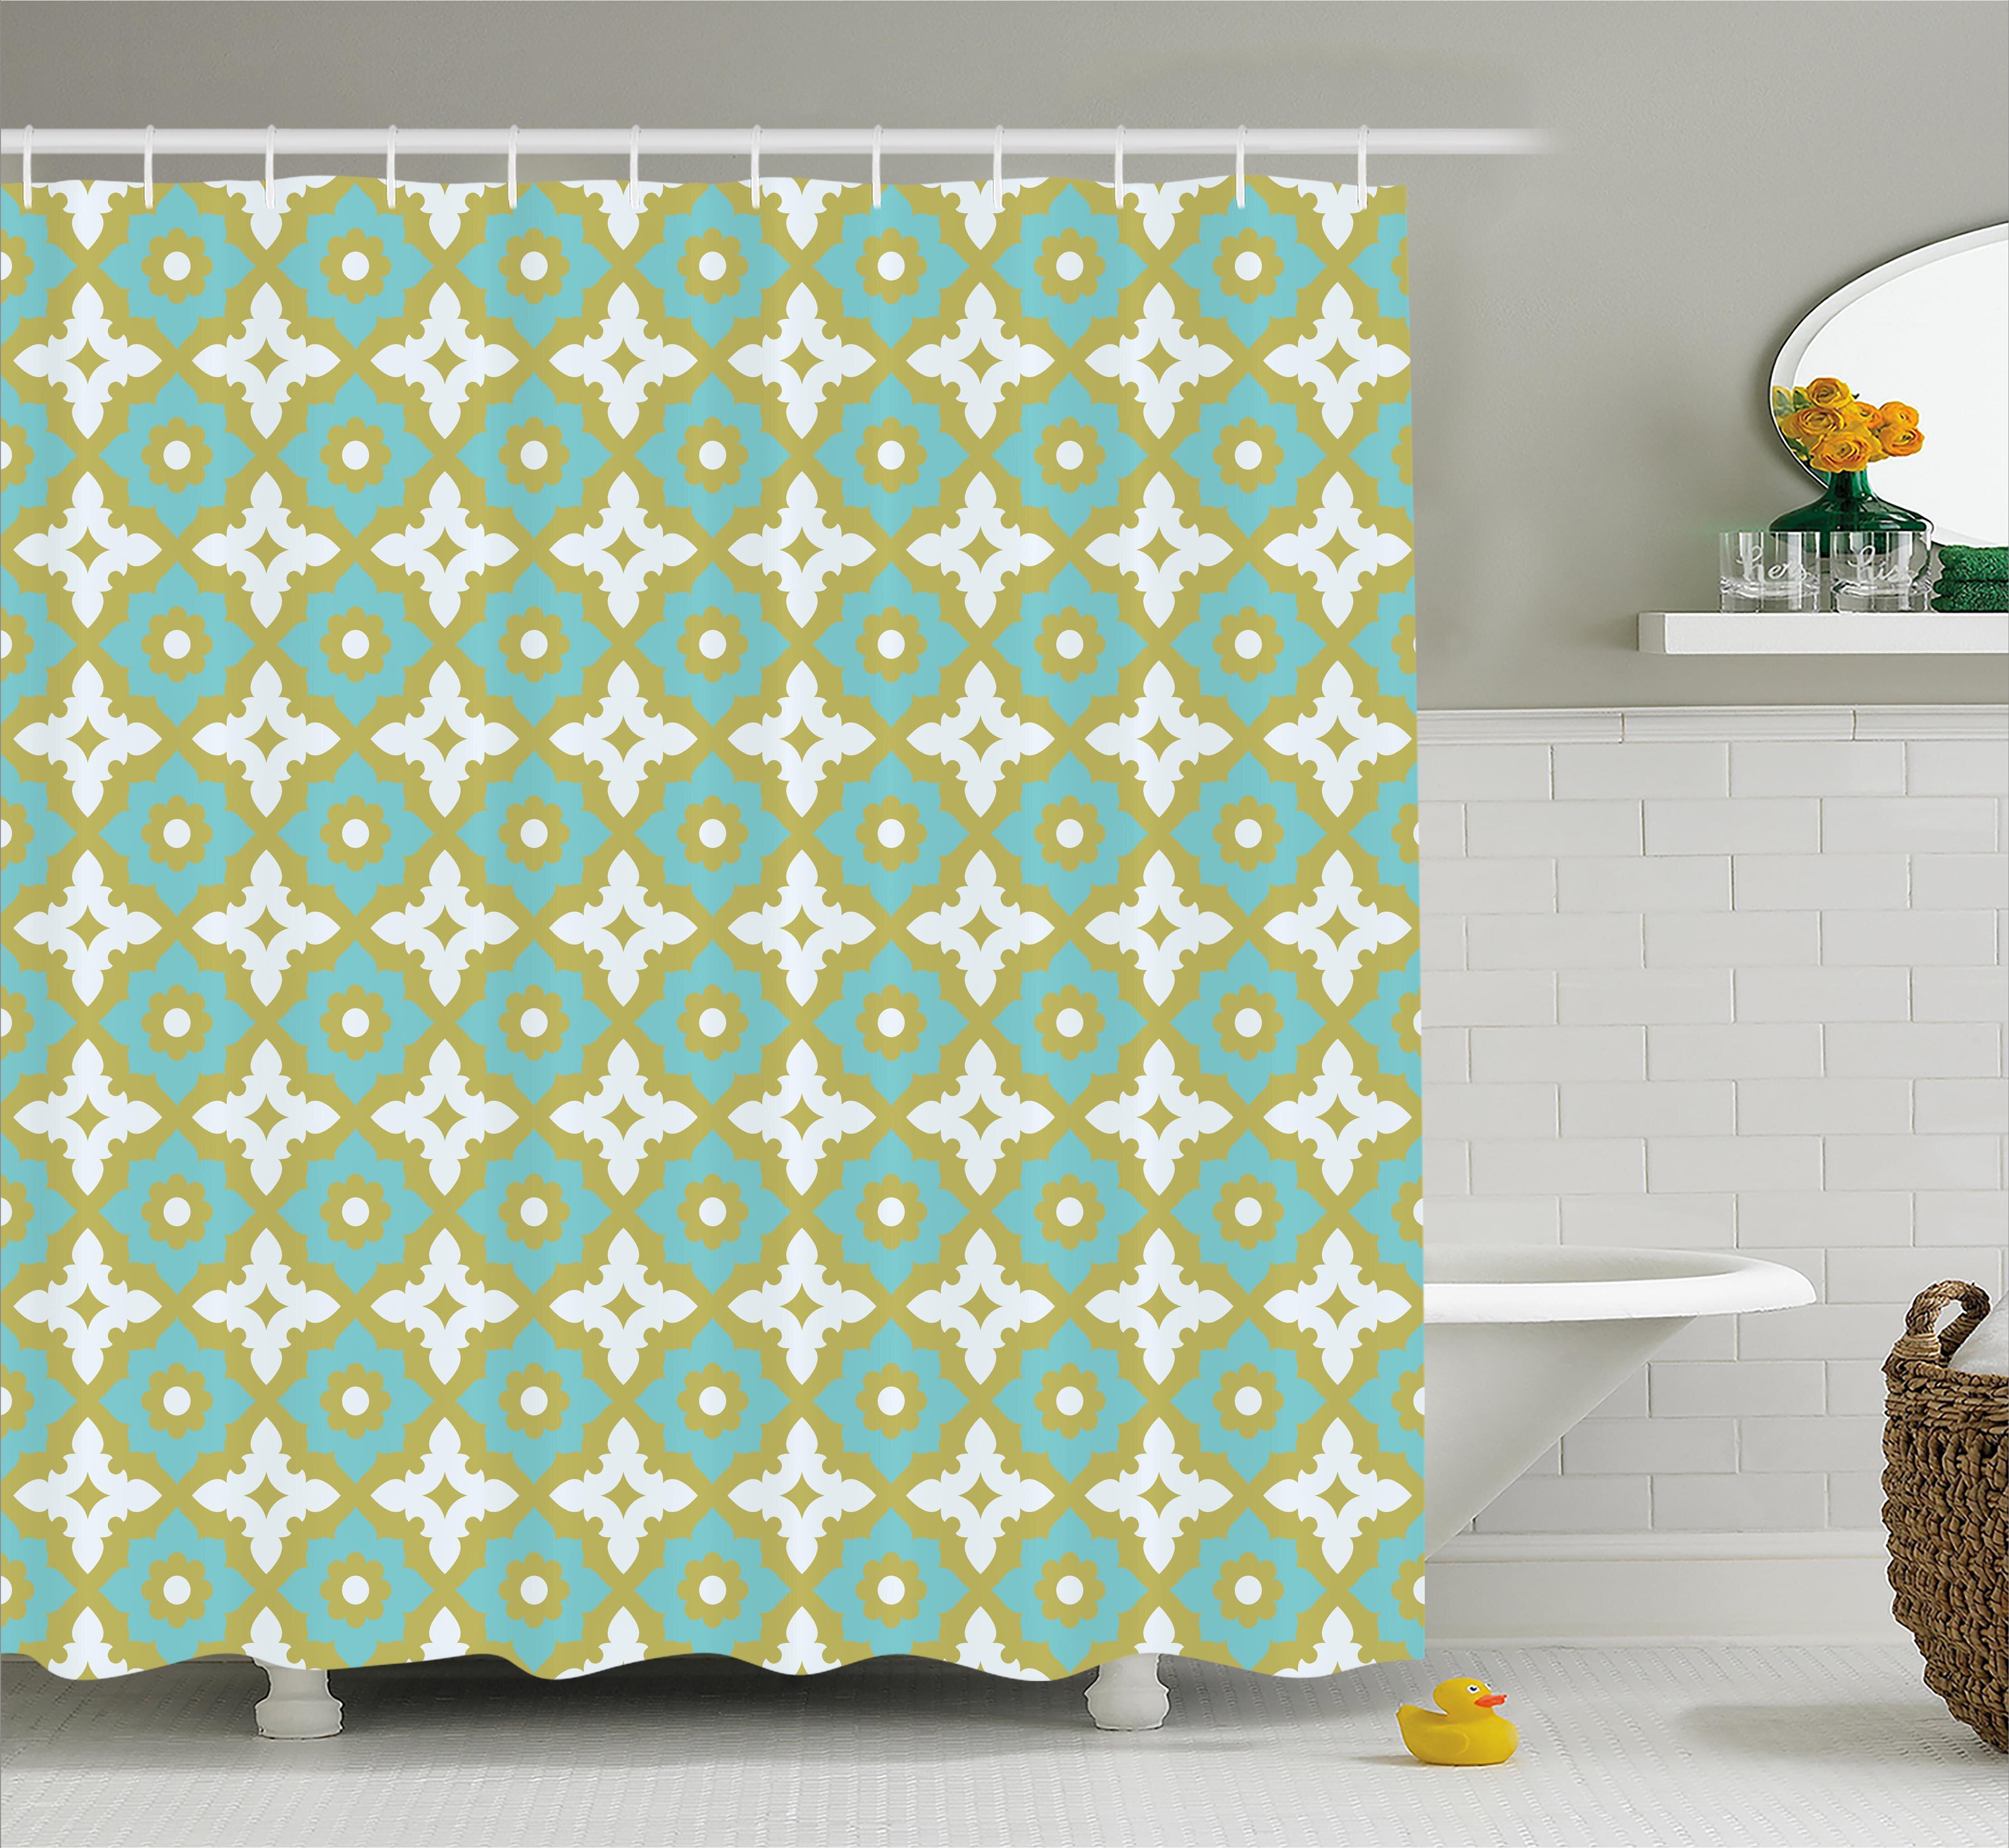 Daveney Floral Tones Ornate Shower Curtain Hooks